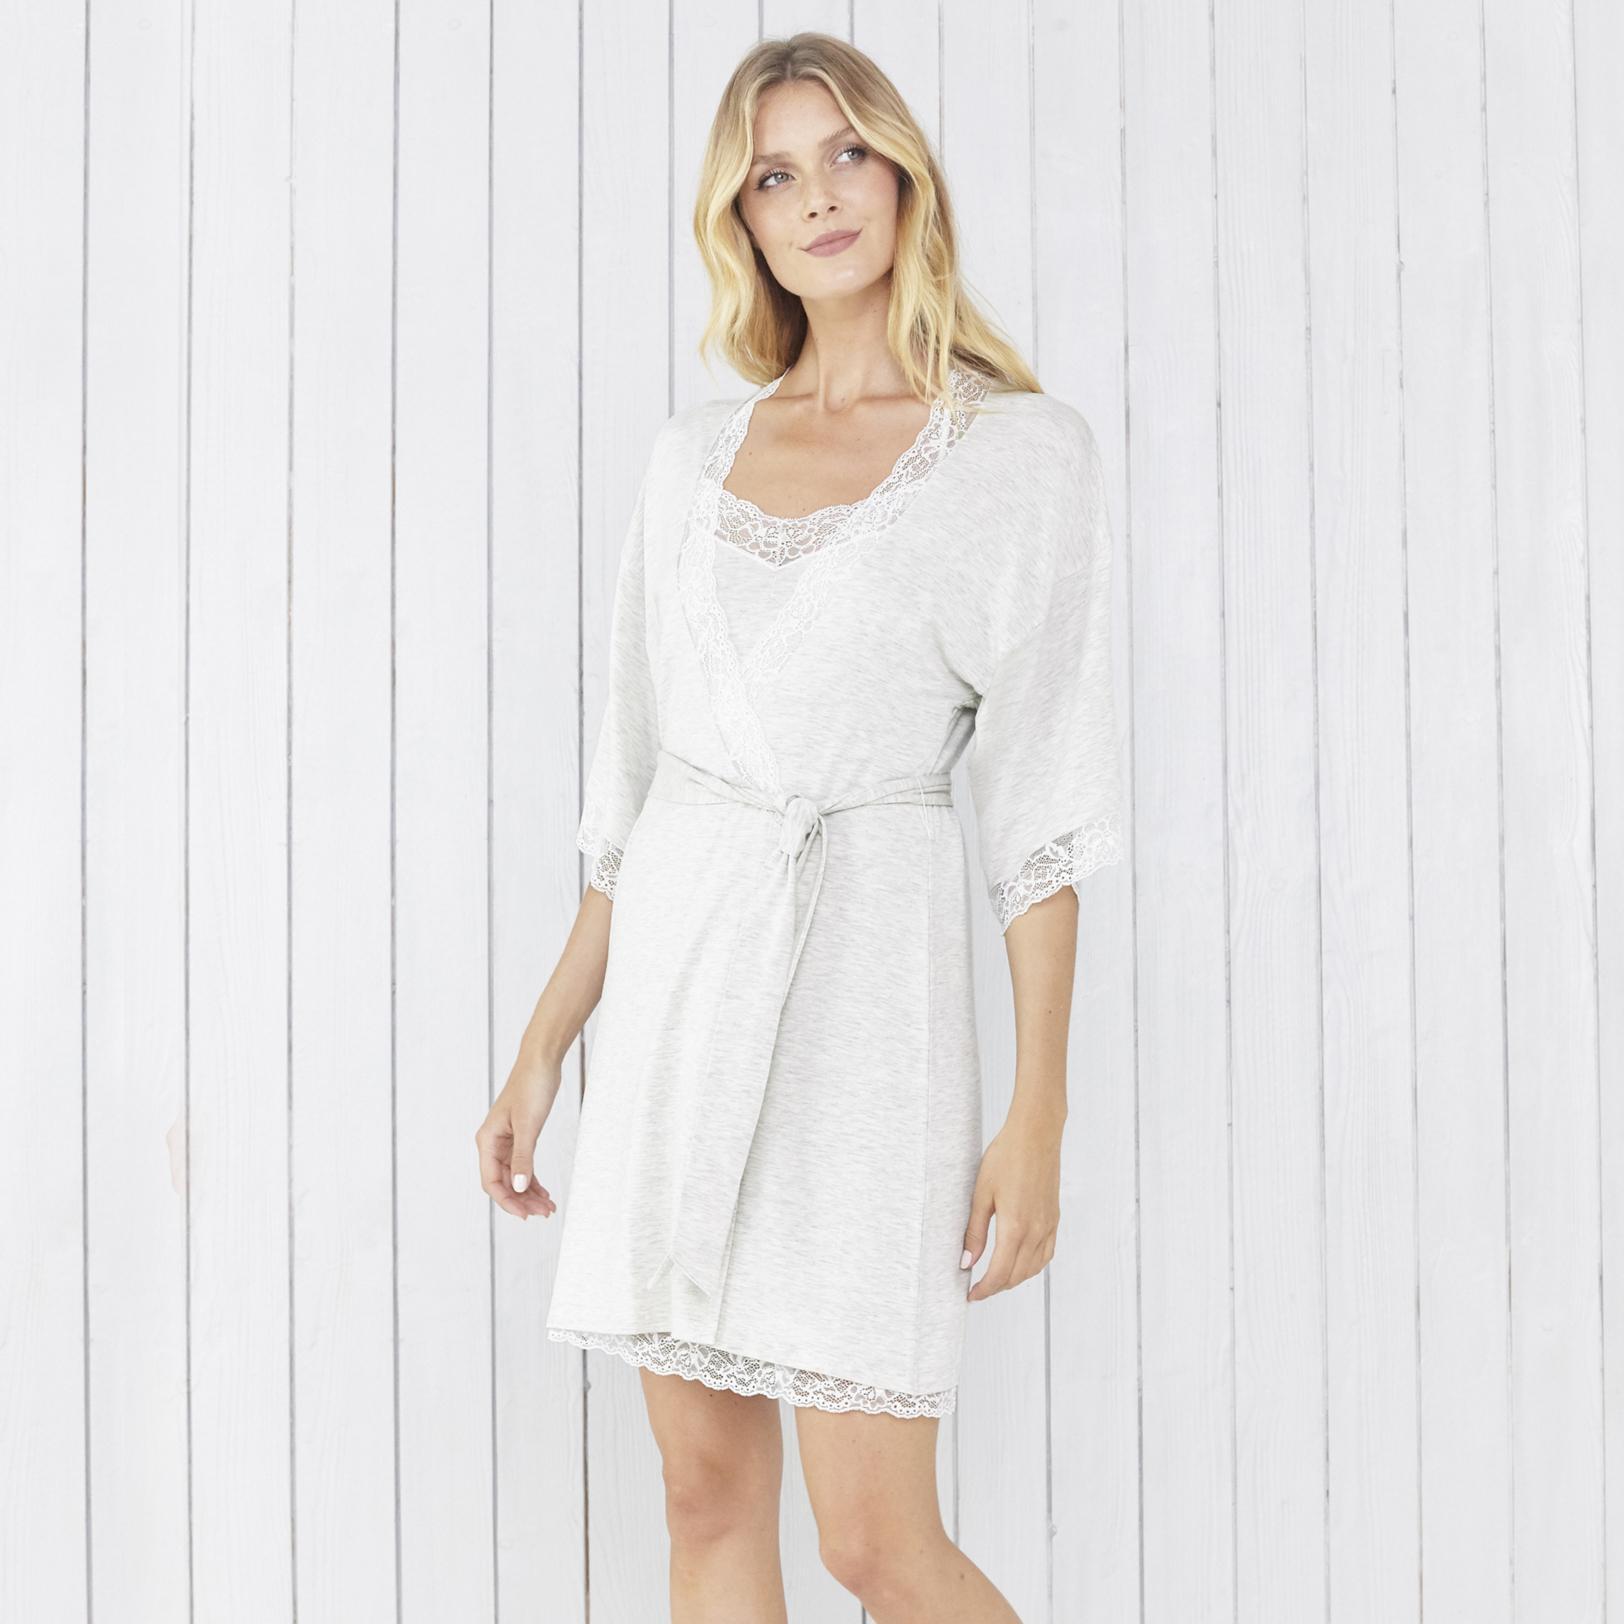 6bae05491259 Lyst - The White Company Eyelash Lace Trim Short Robe in White